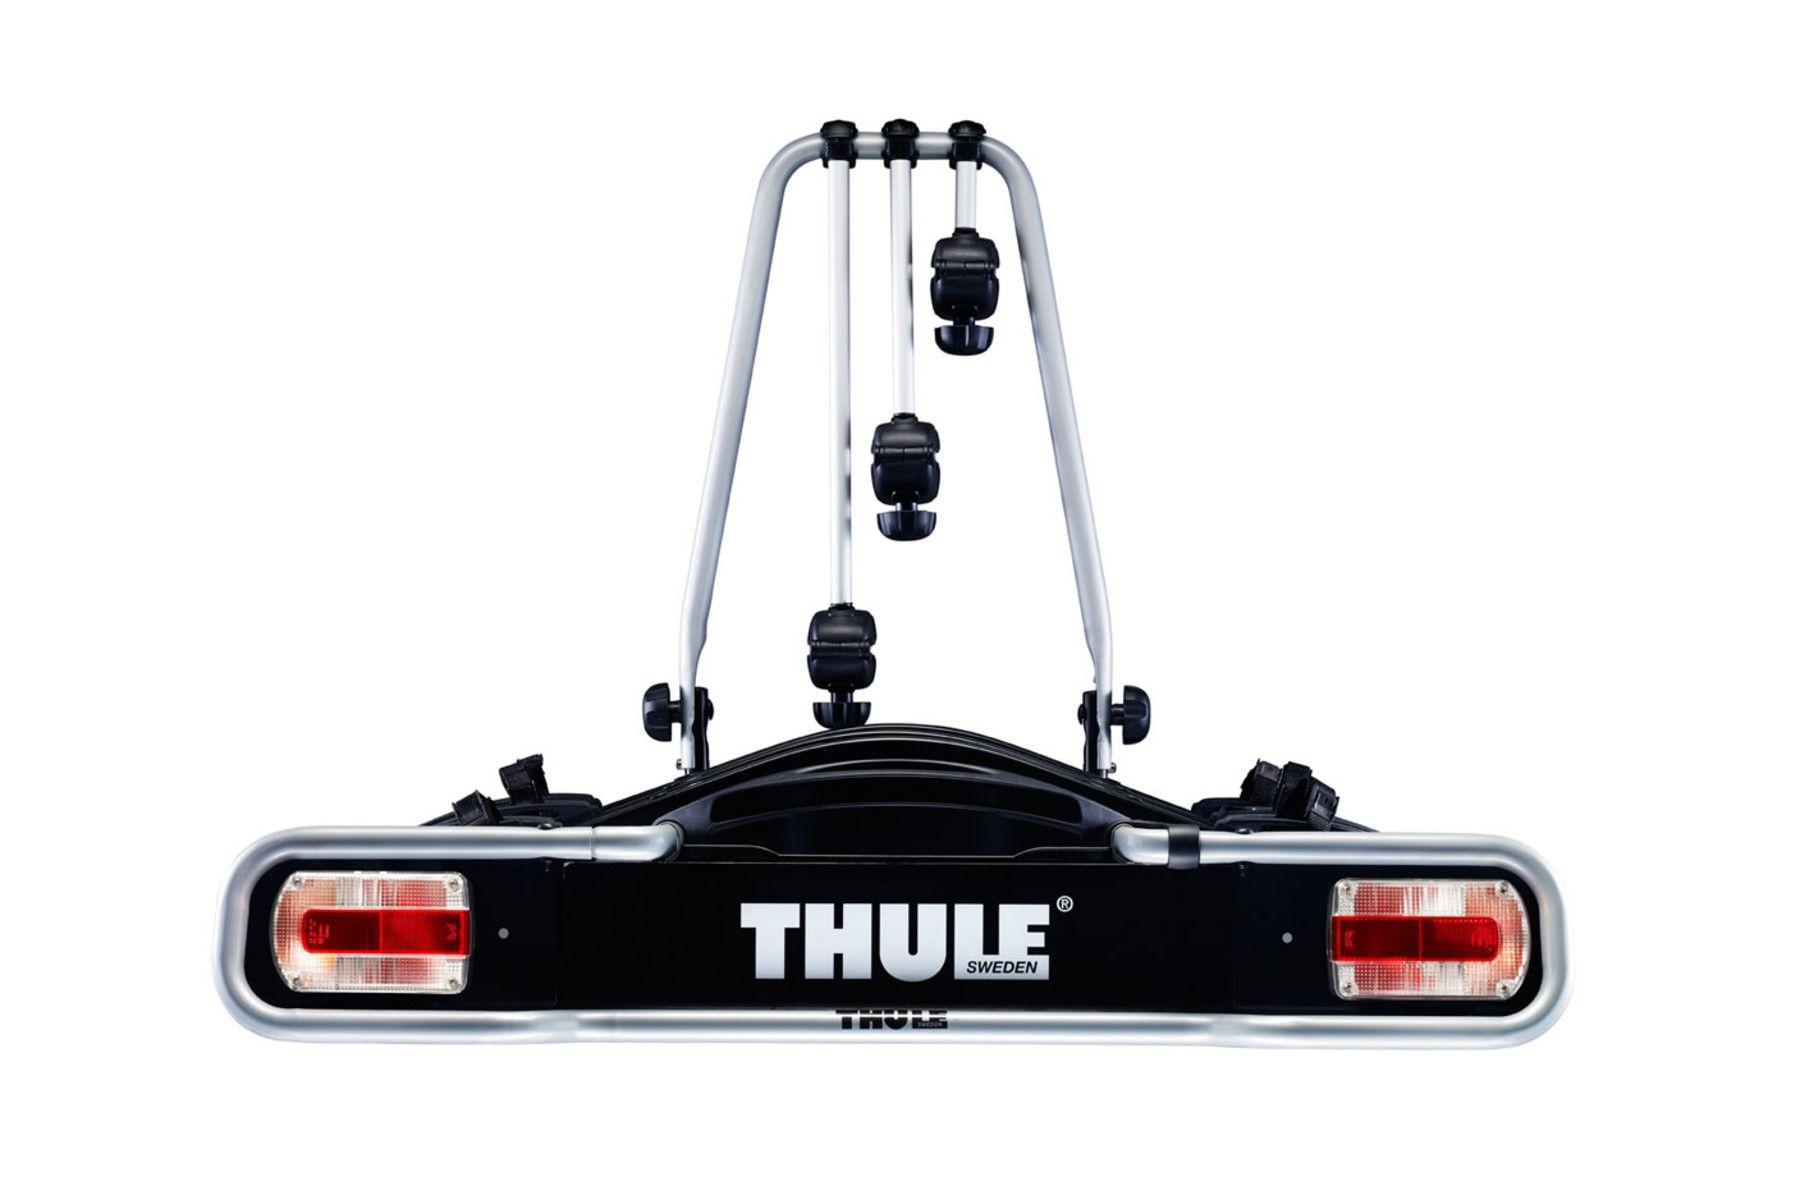 Thule EuroRide 3